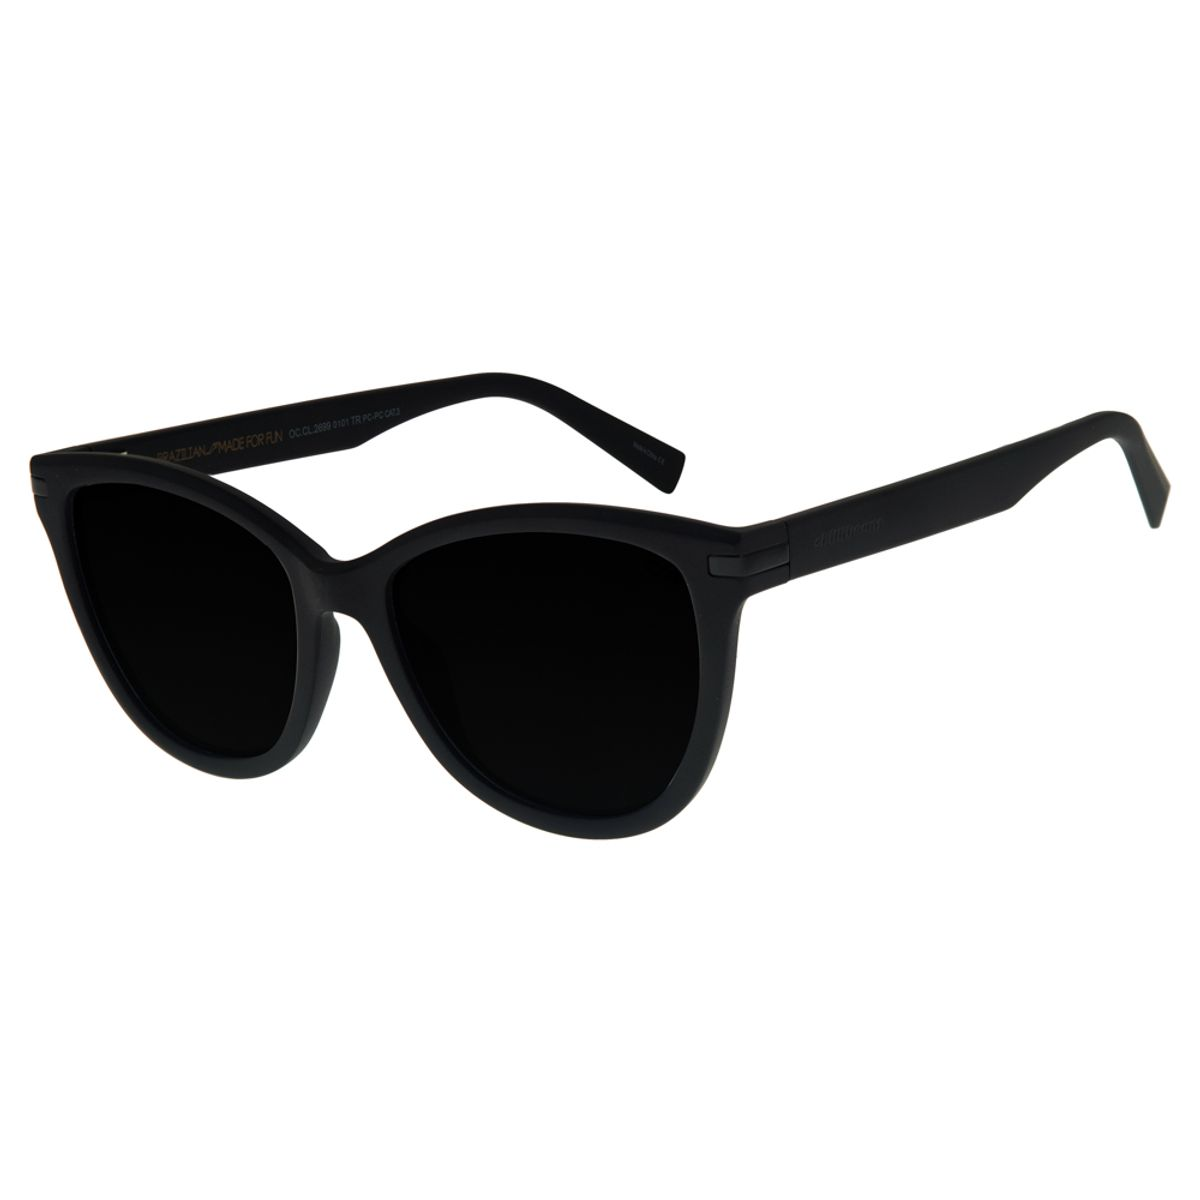 38c54860b Óculos de Sol Chilli Beans Feminino Redondo Preto - Chilli Beans